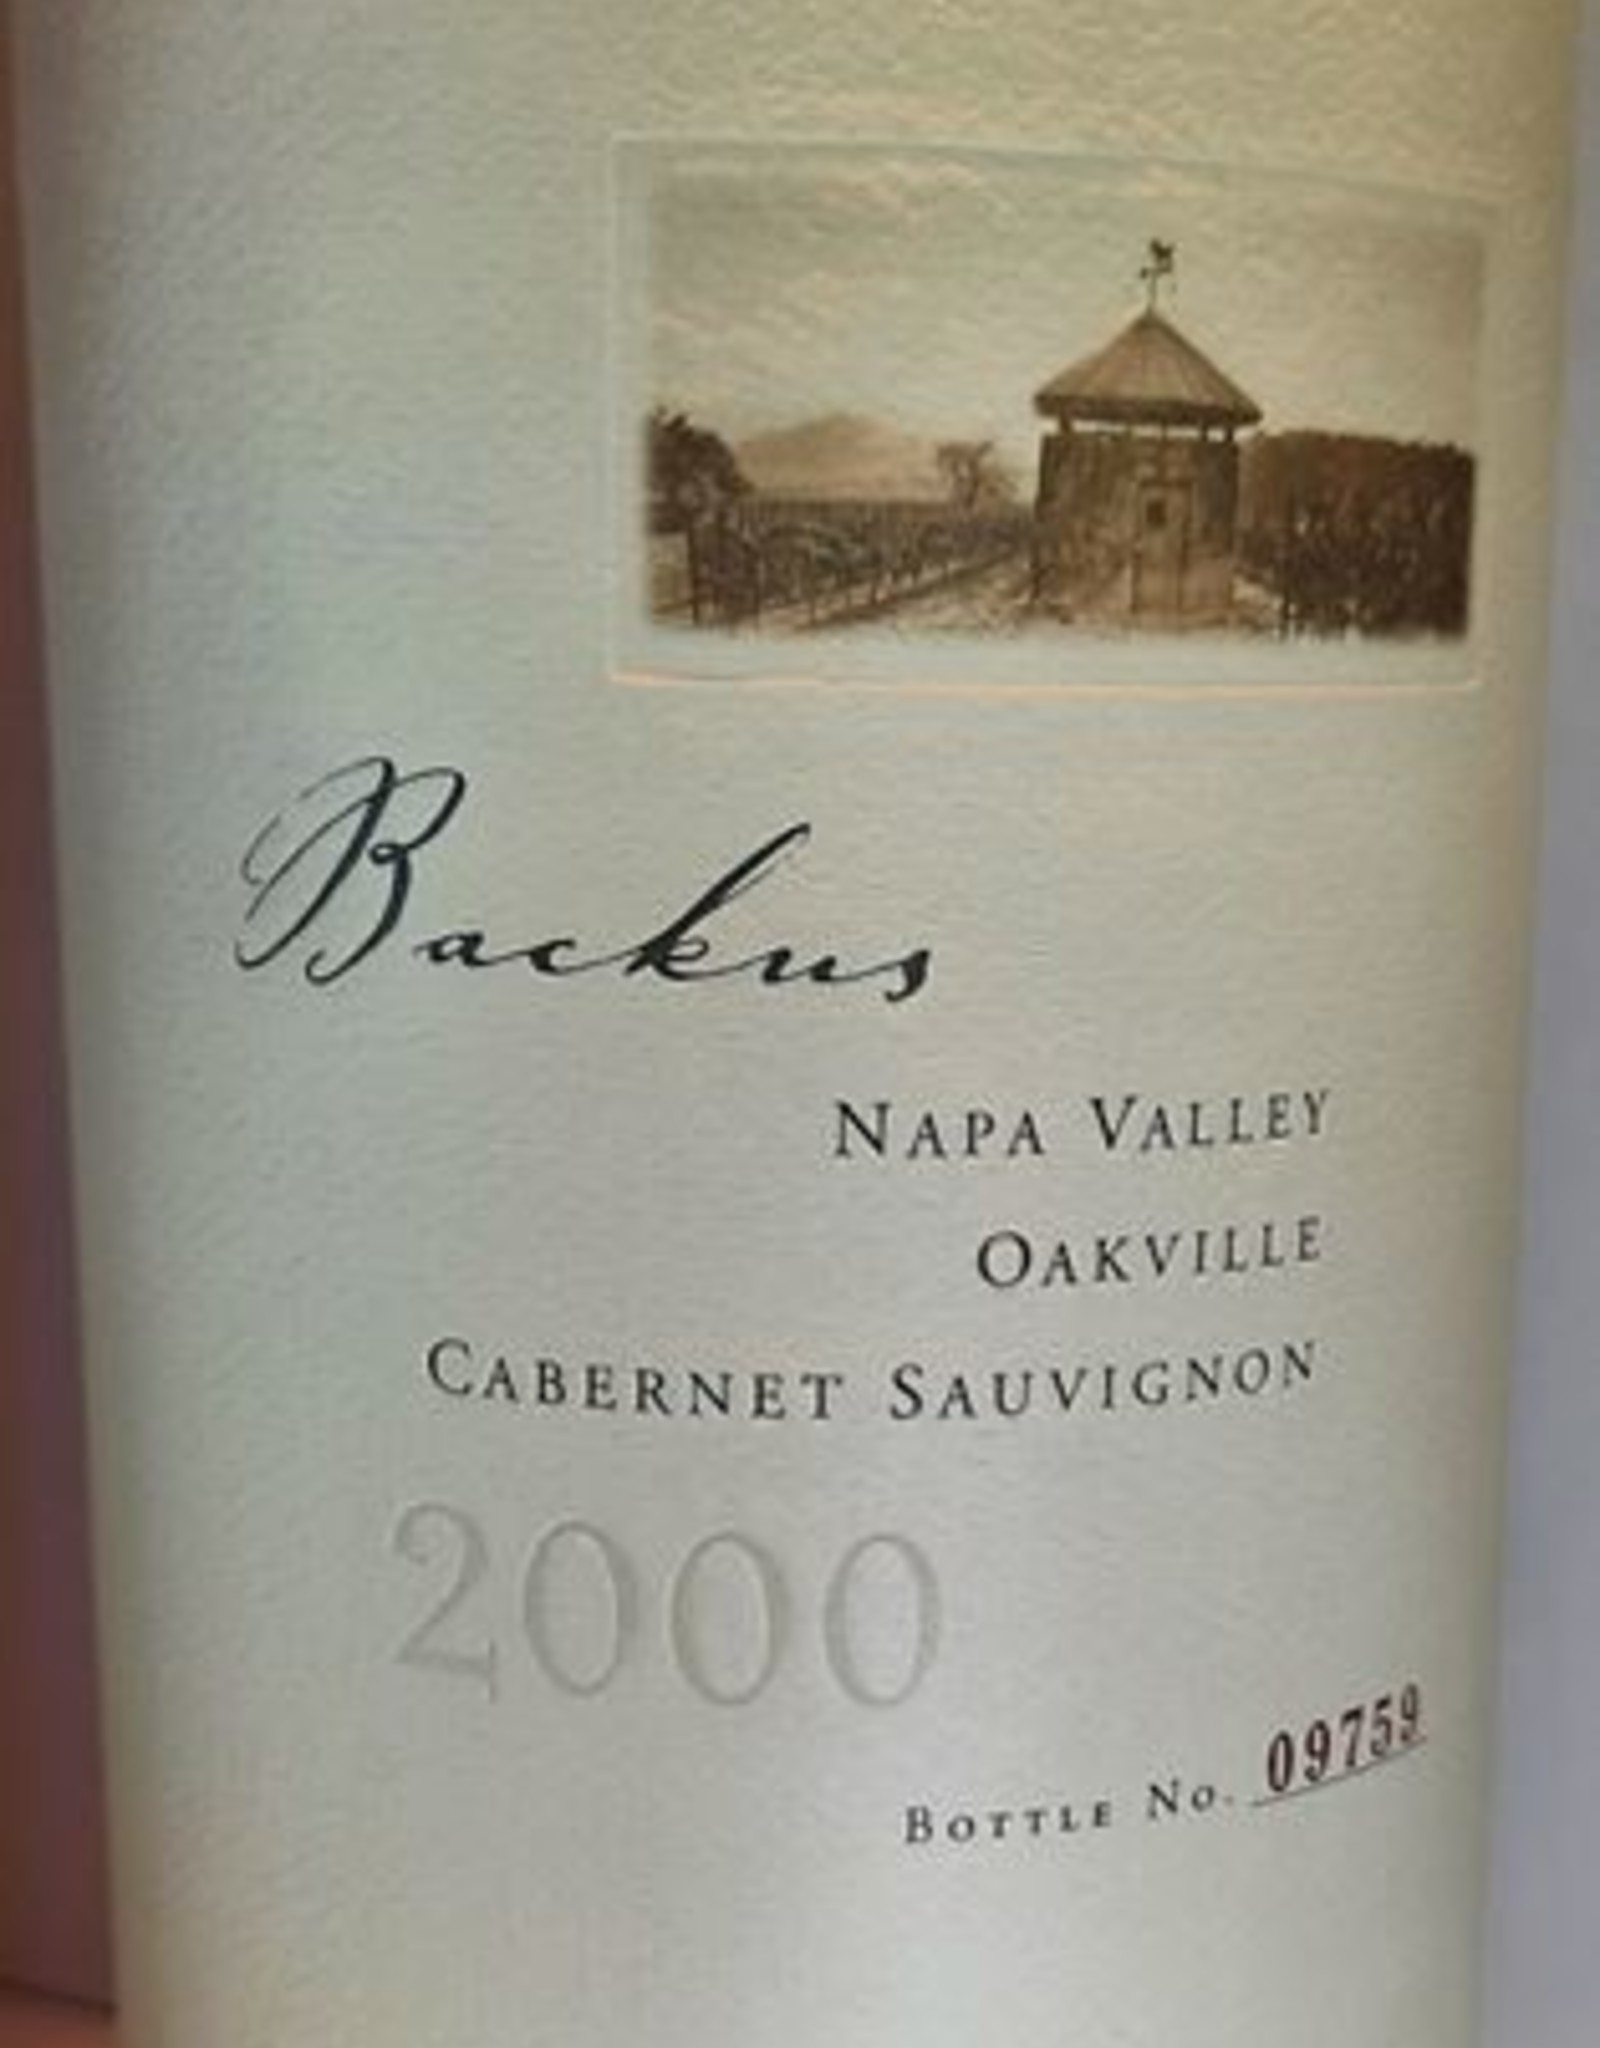 Phelps Cabernet Sauvignon Backus 2000